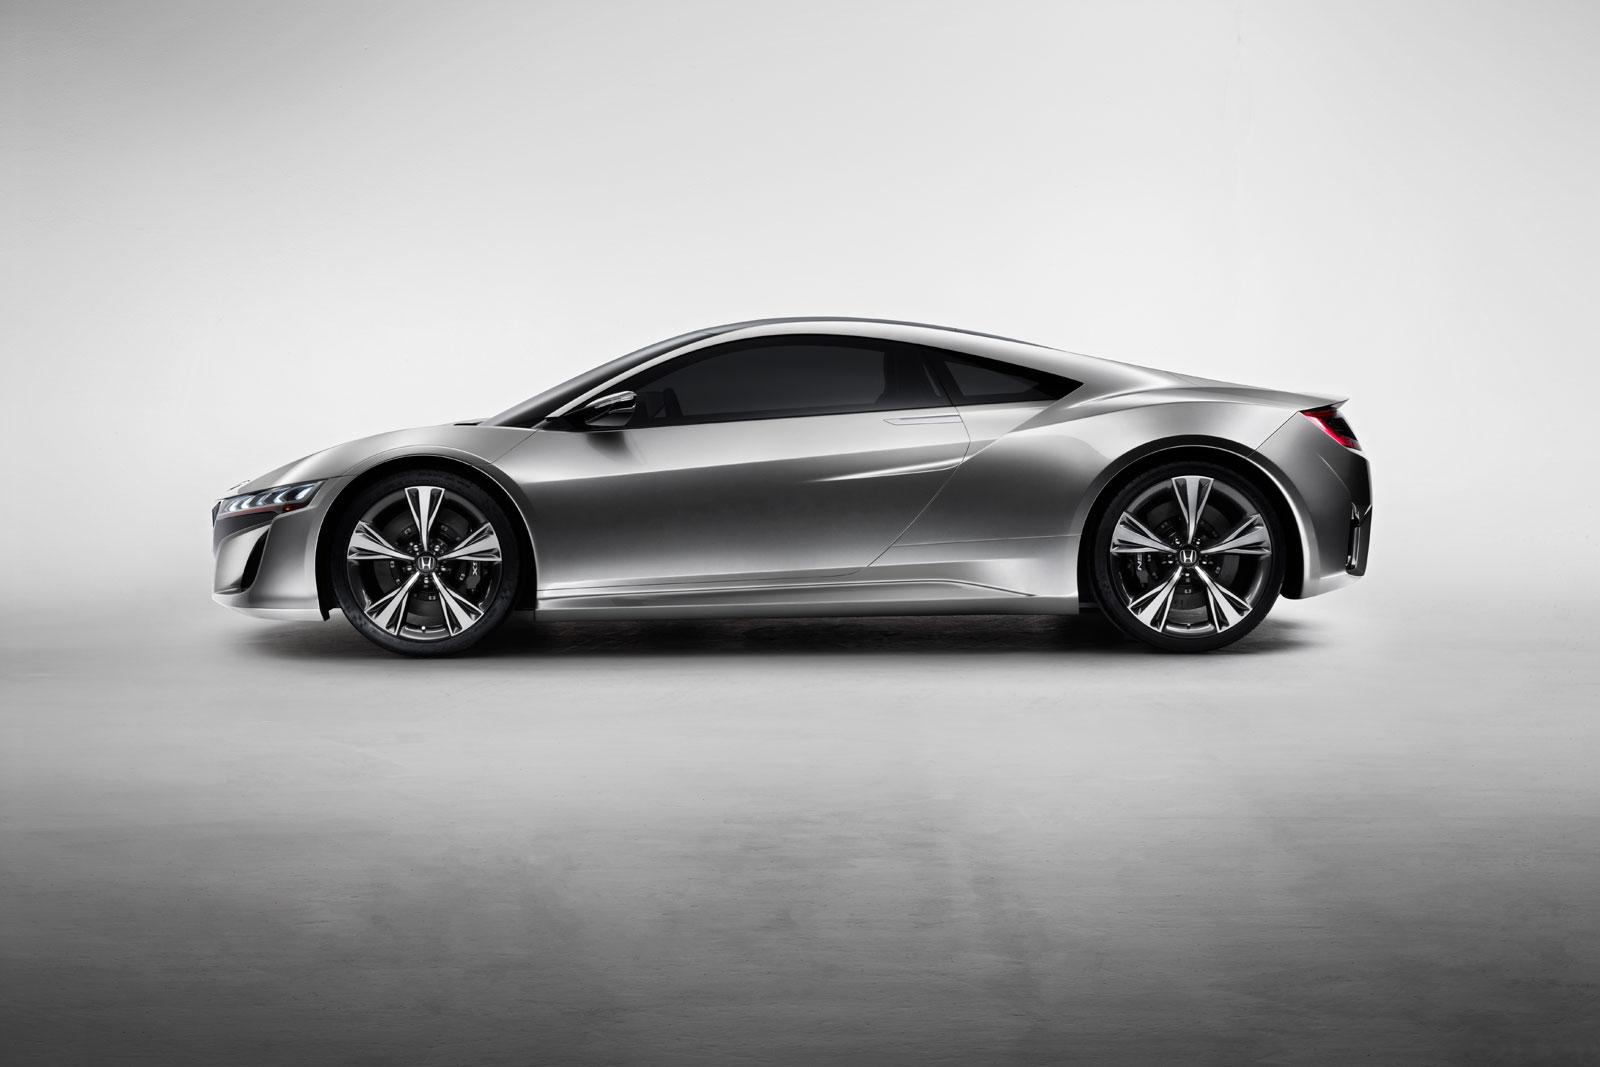 2012 Honda NSX - Концепты